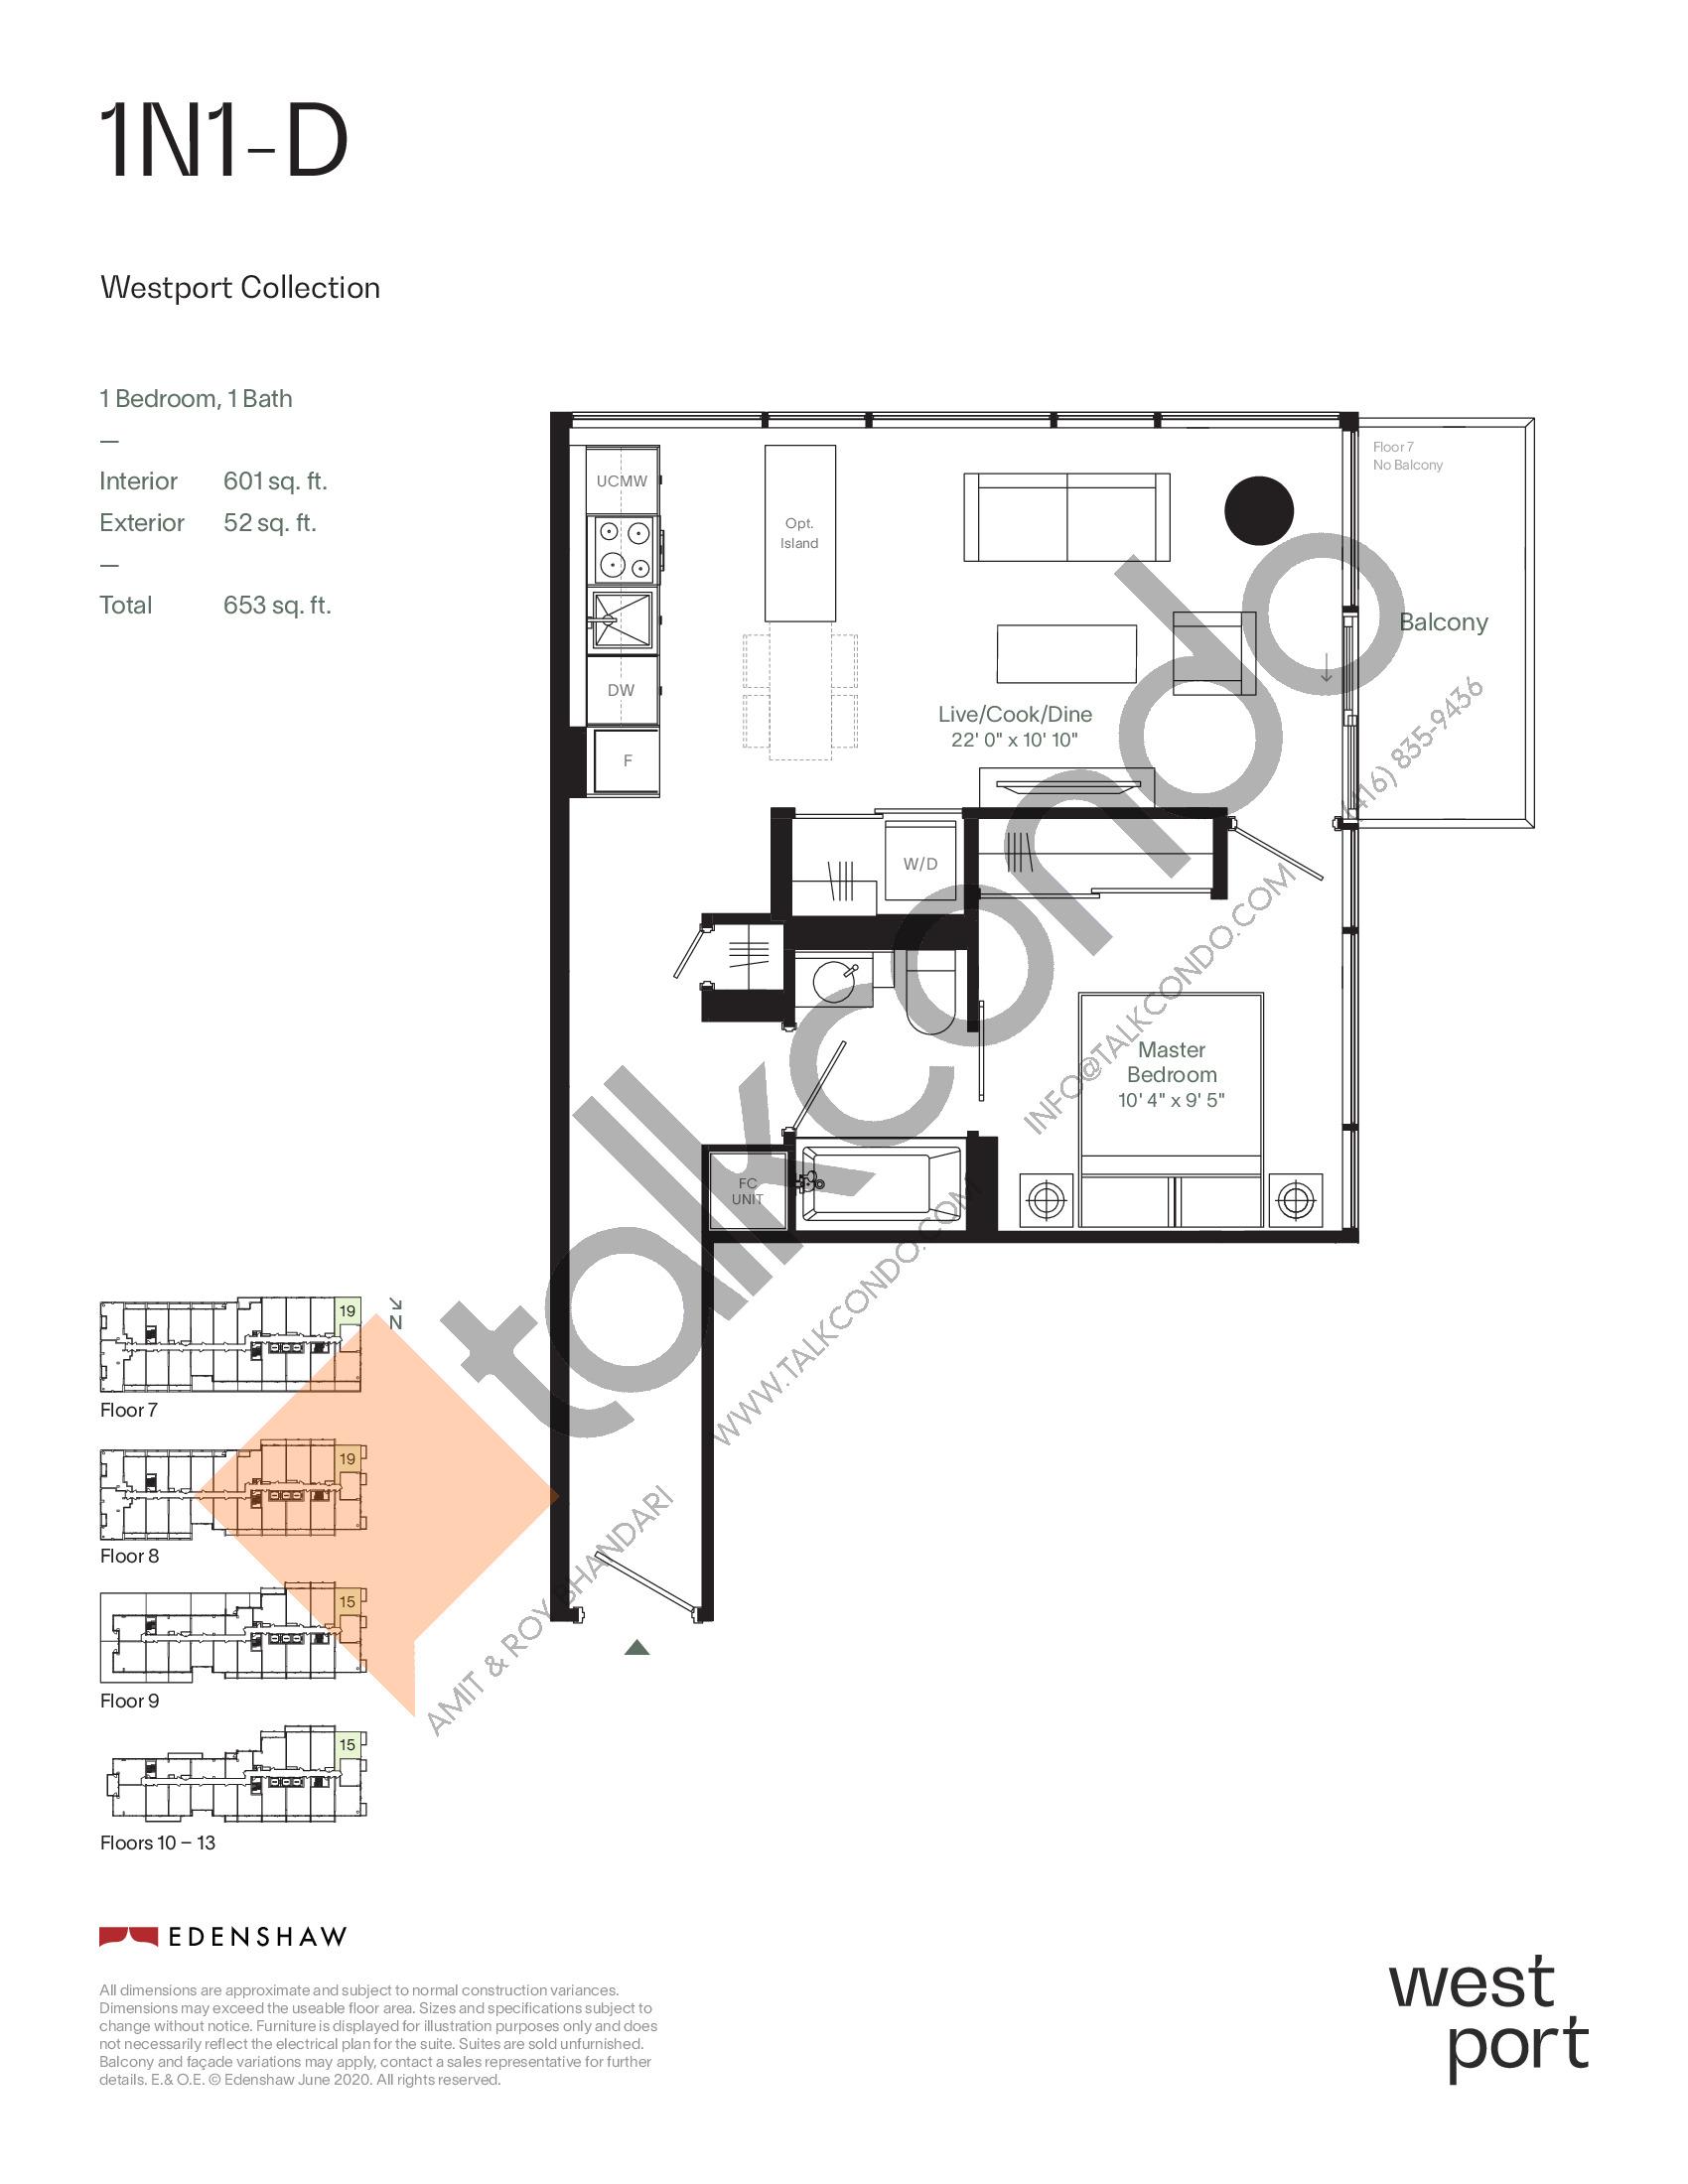 1N1-D - Westport Collection Floor Plan at Westport Condos - 601 sq.ft